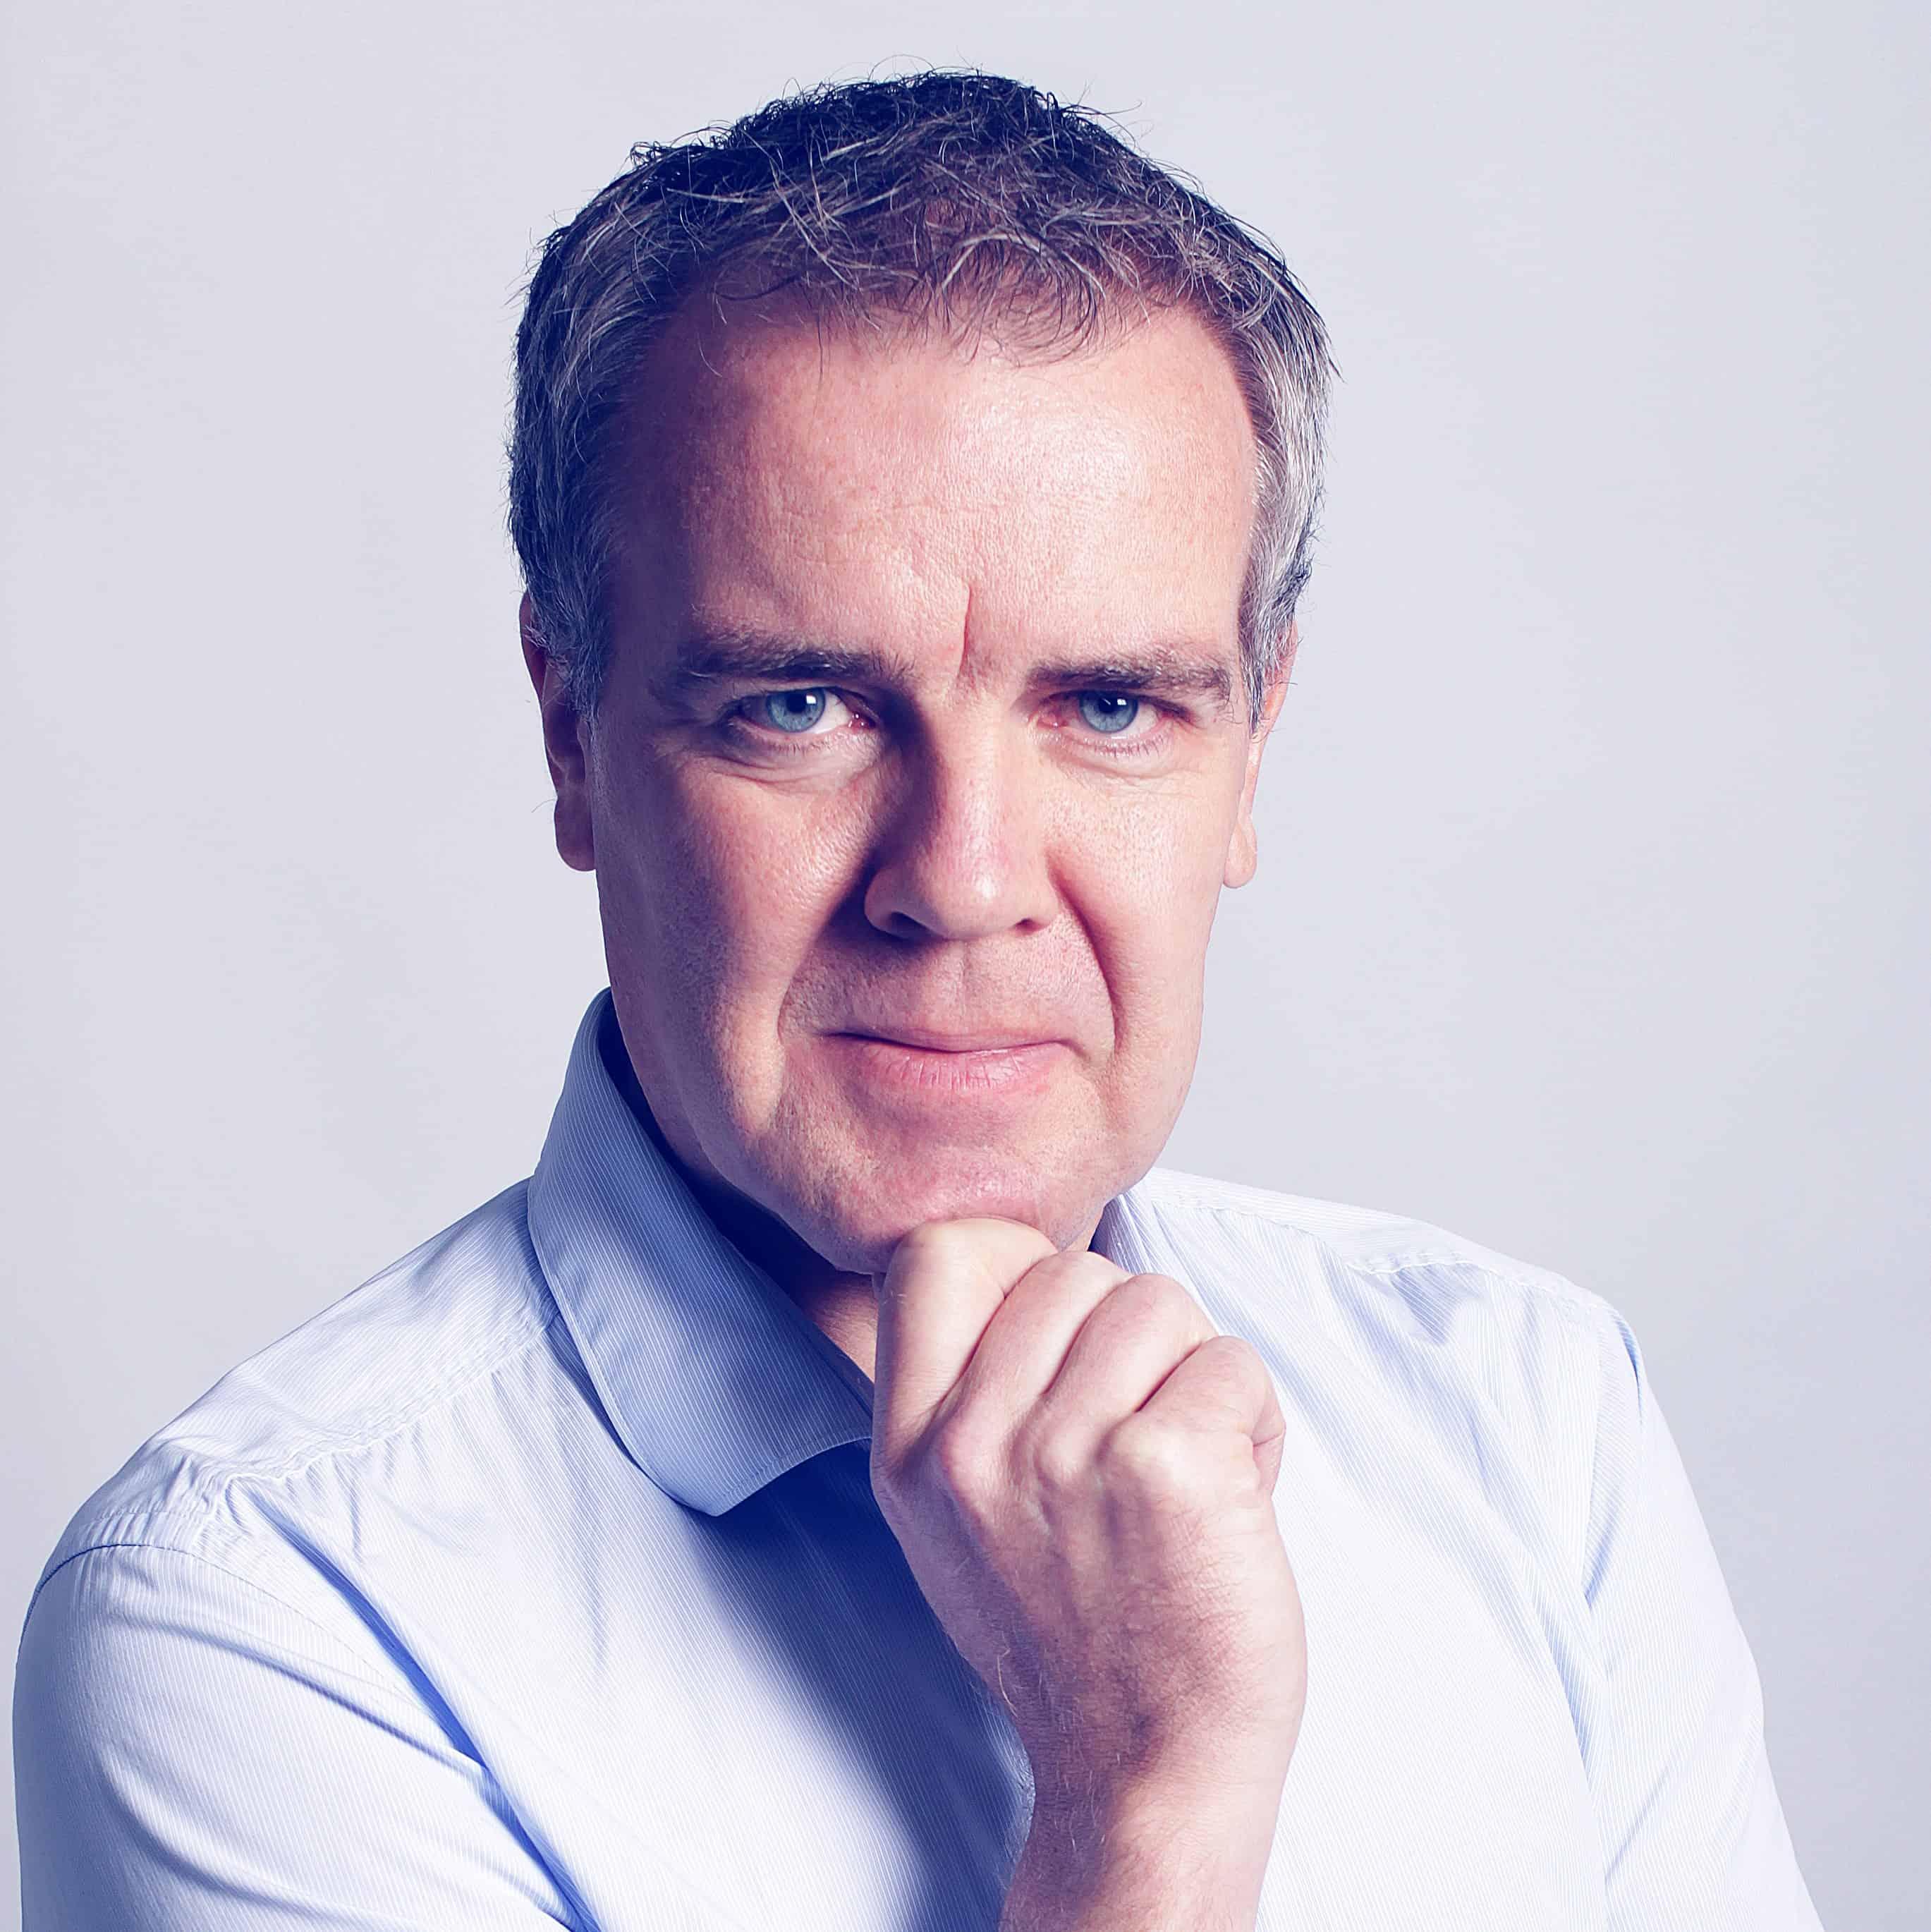 Per-Anders Jönsson